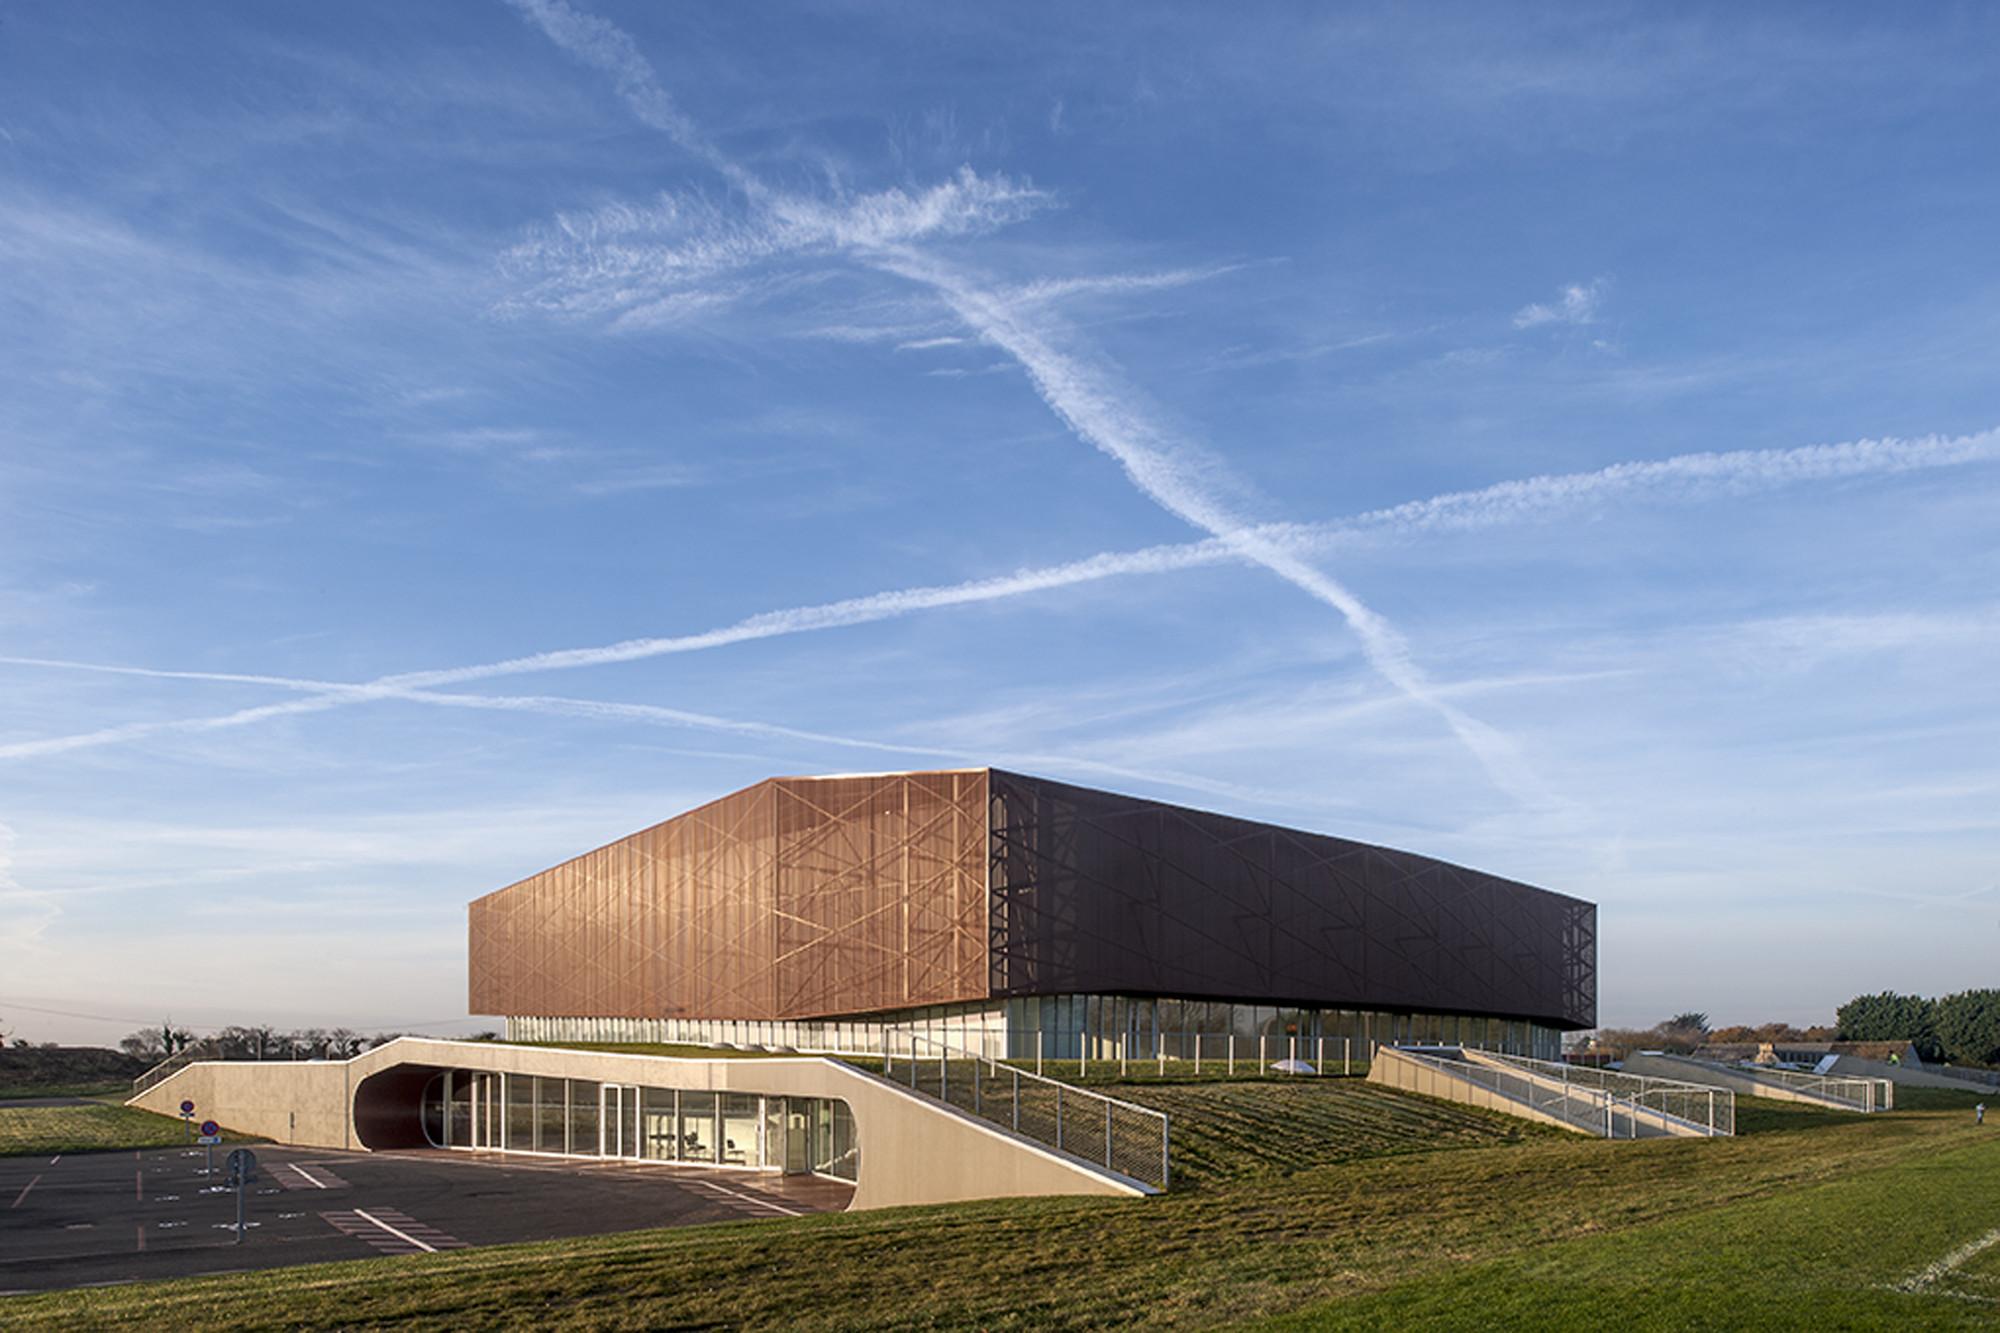 Gymnasium Plabennec / Bohuon Bertic Architectes, © Patrick Miara